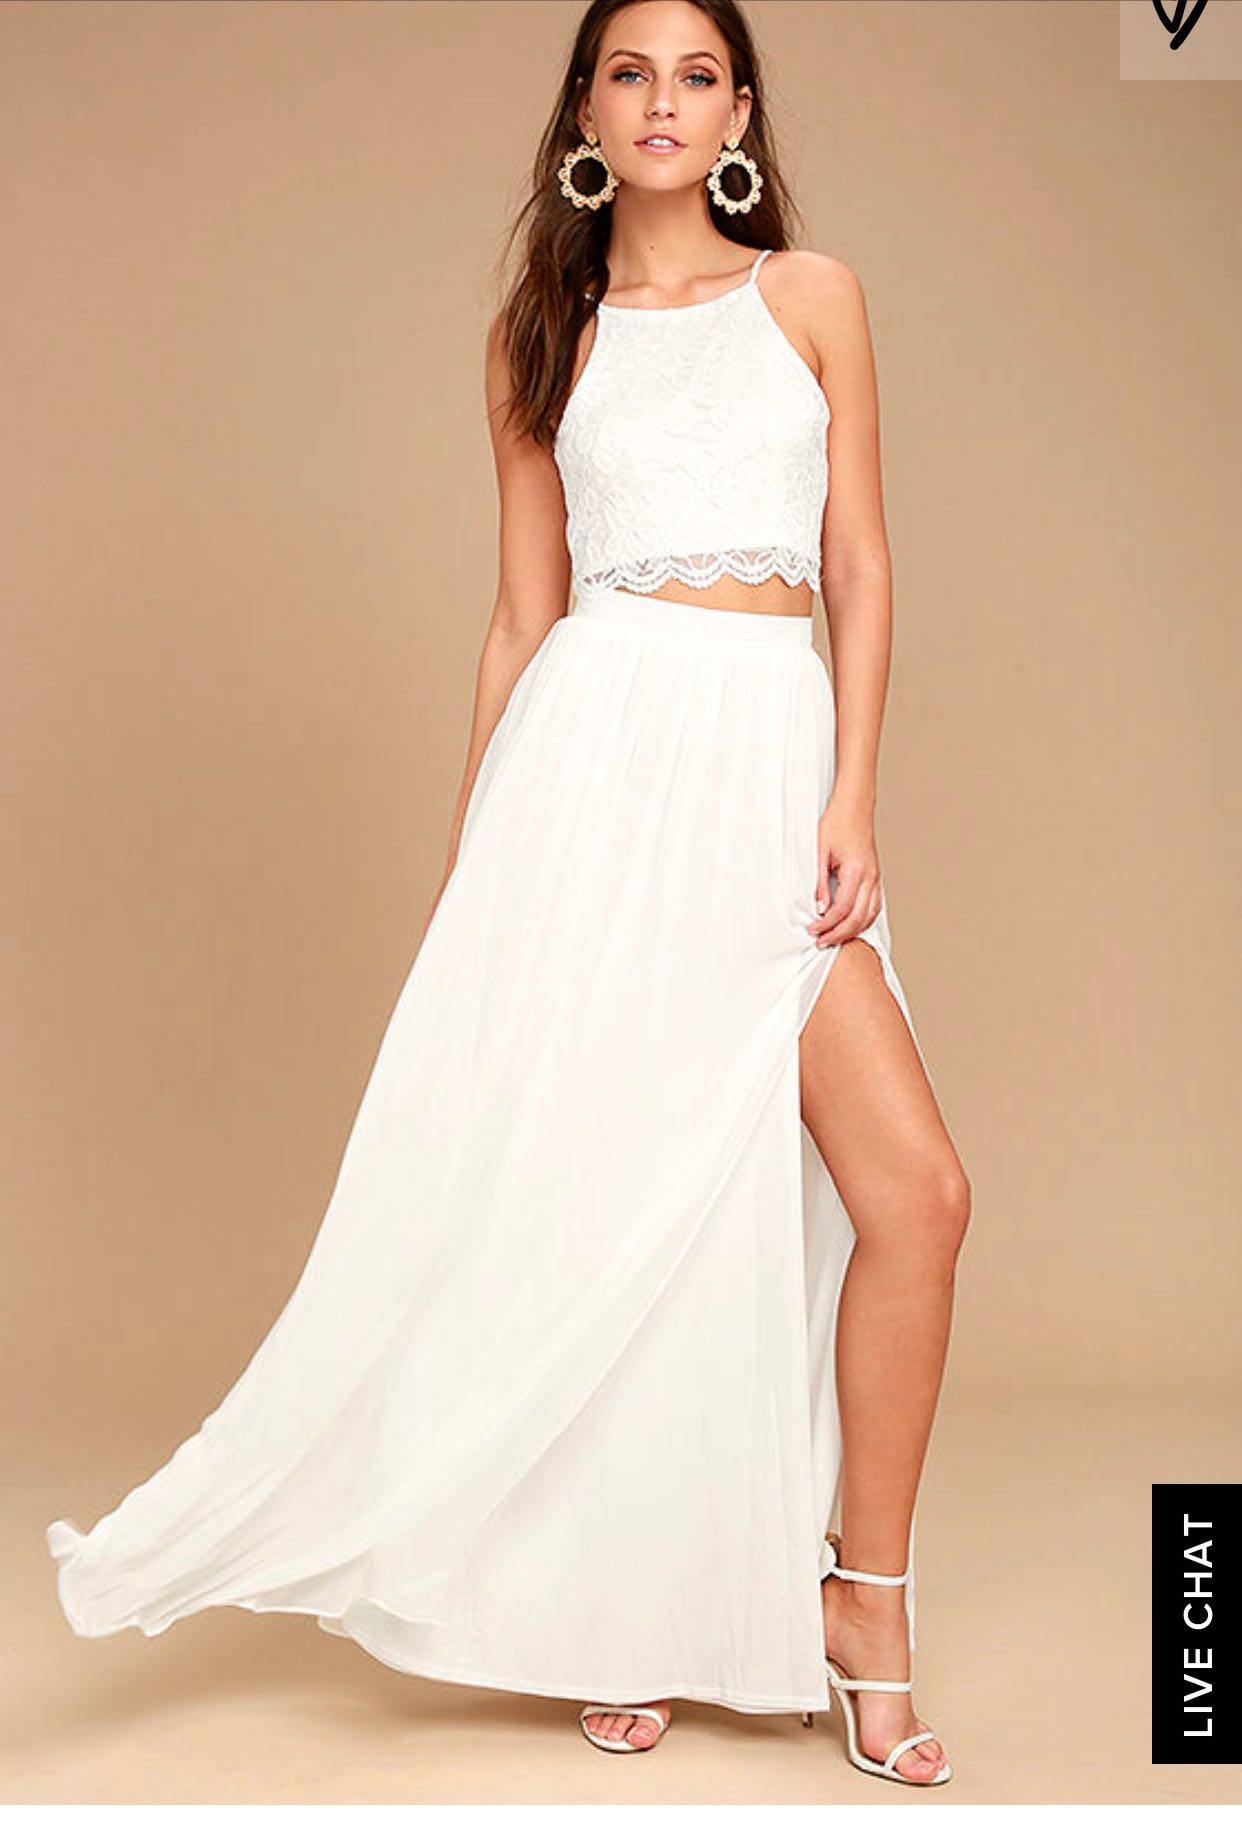 2 piece bohemian white dress for your garden solemnisation!